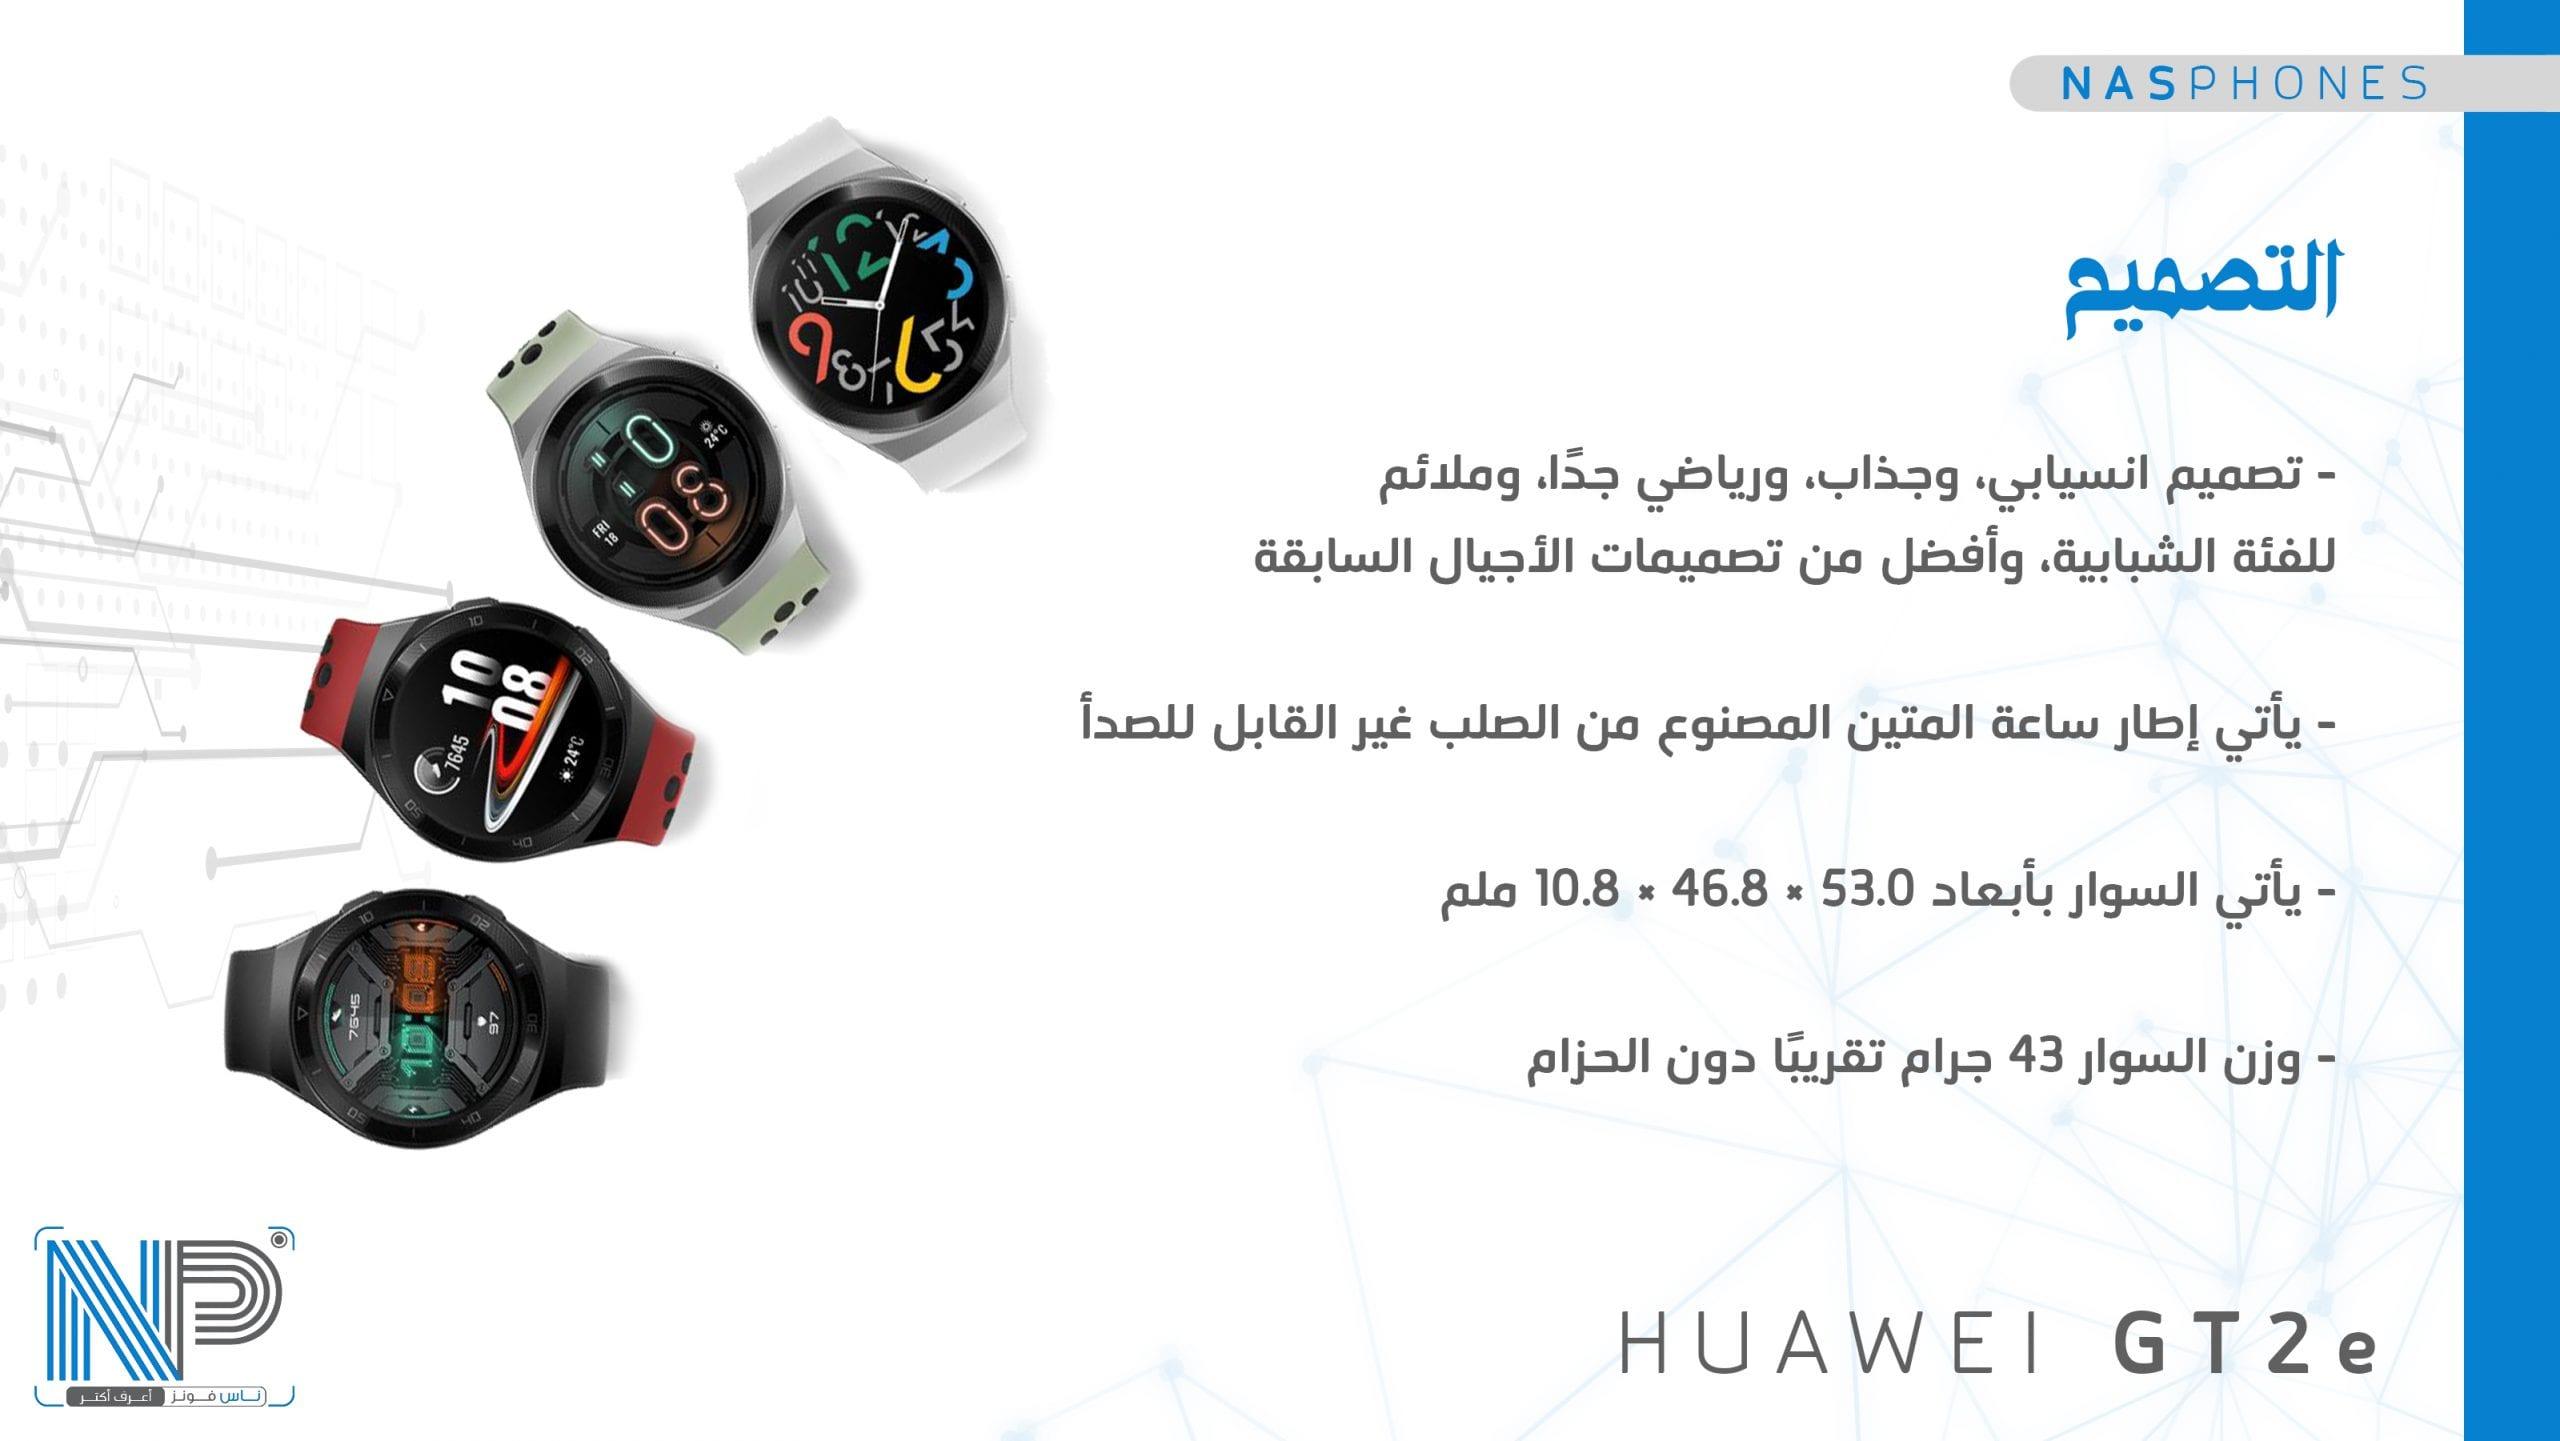 تصميم Huawei GT2e